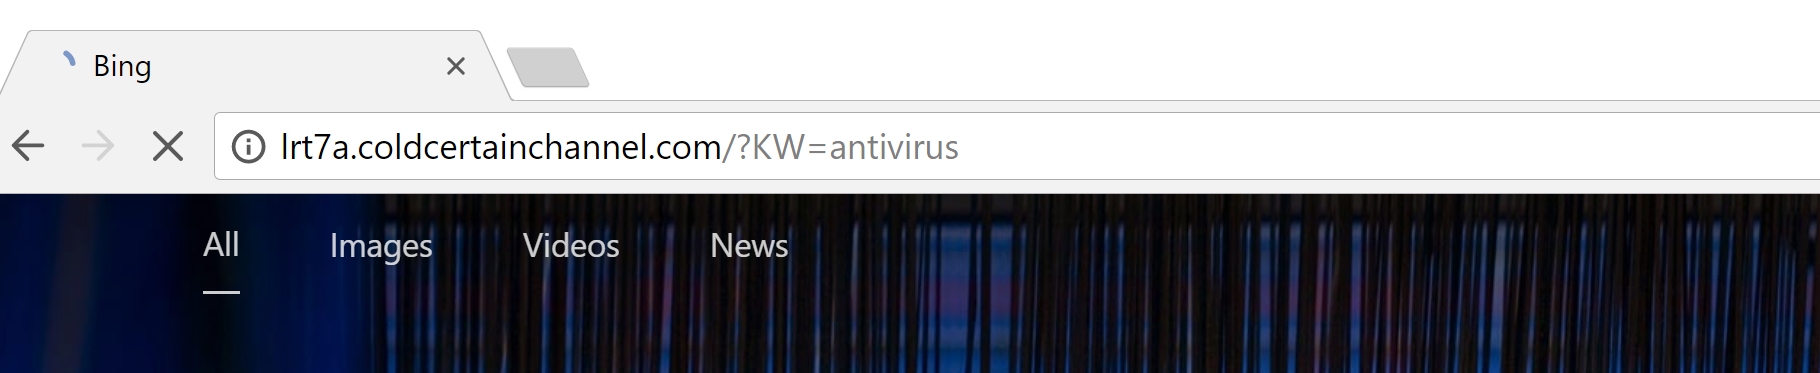 lrt7a.coldcertainchannel.com redirect virus